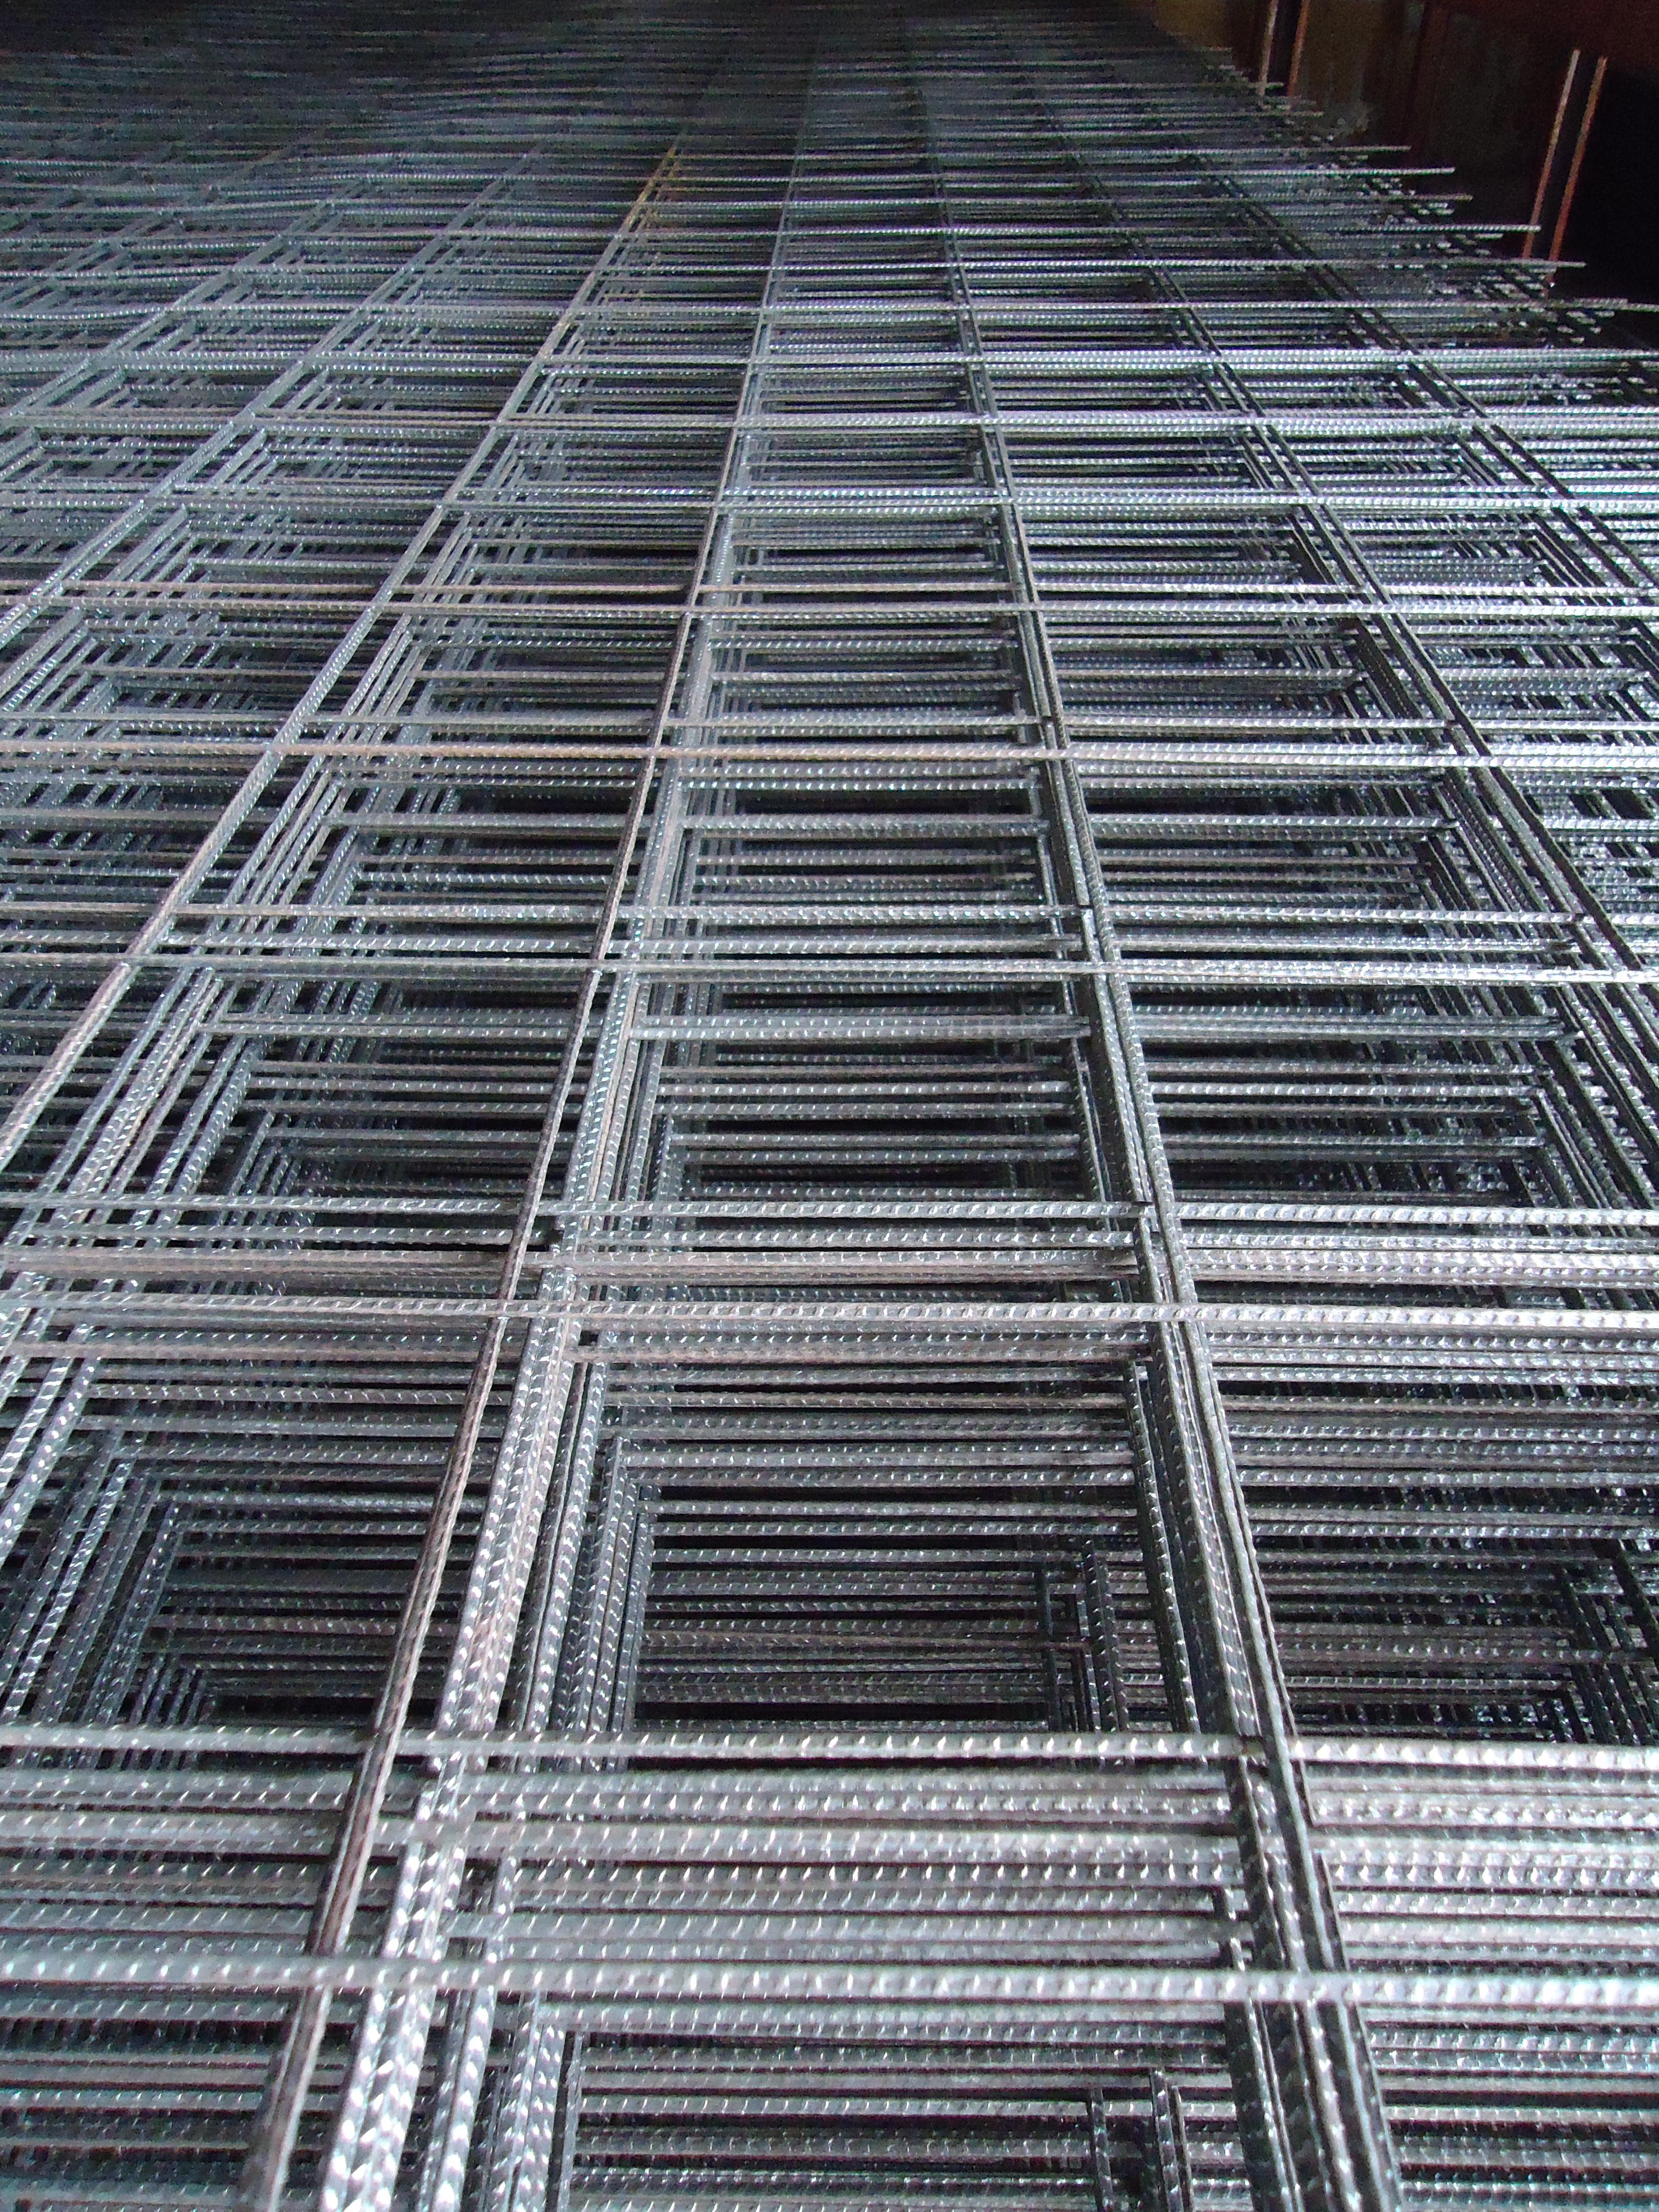 Malla electrosoldada tubolaminas ferreter a for Malla de construccion